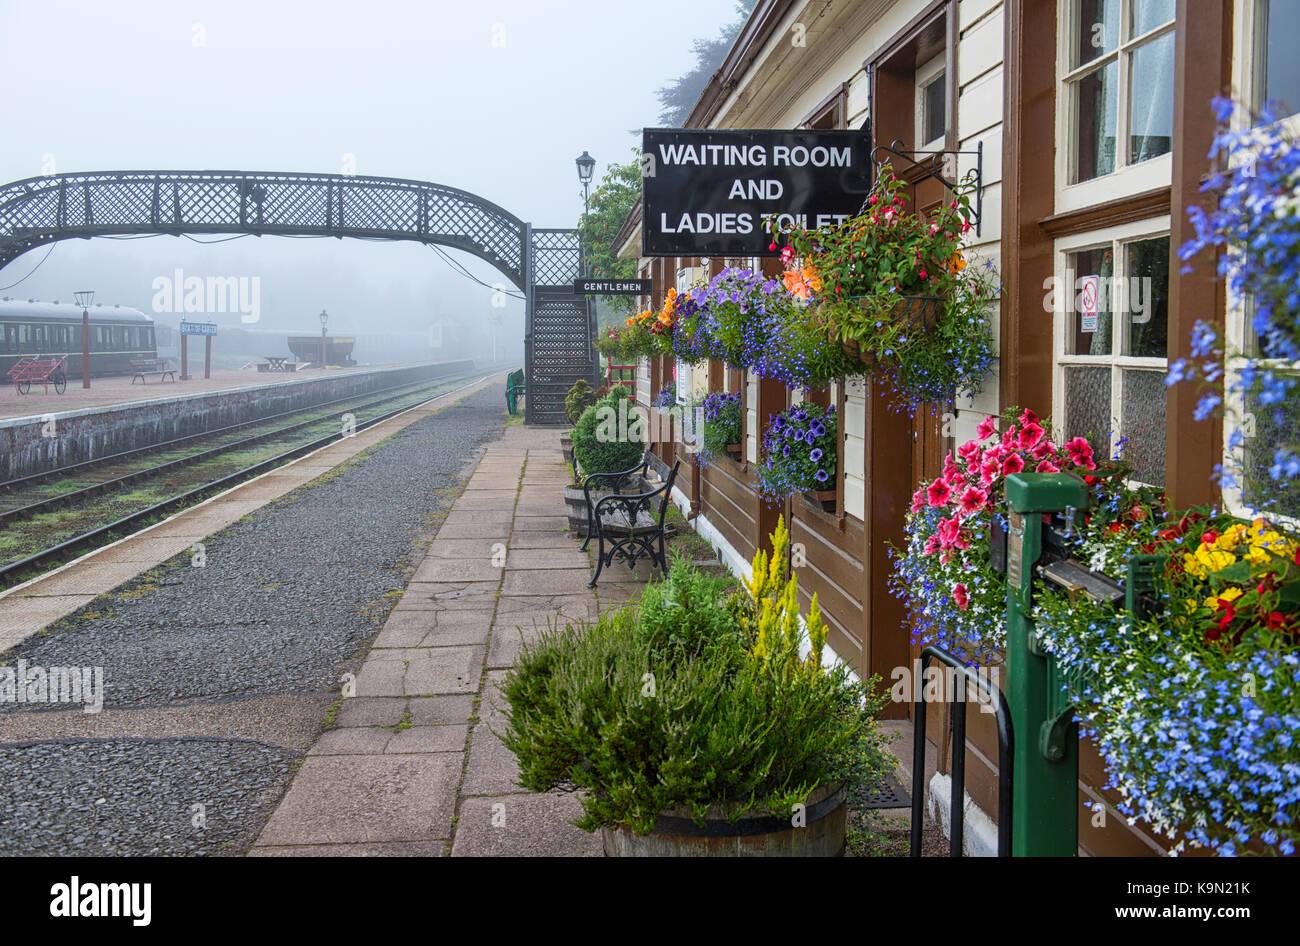 Boat of Garten station in Scotland, UK Stock Photo